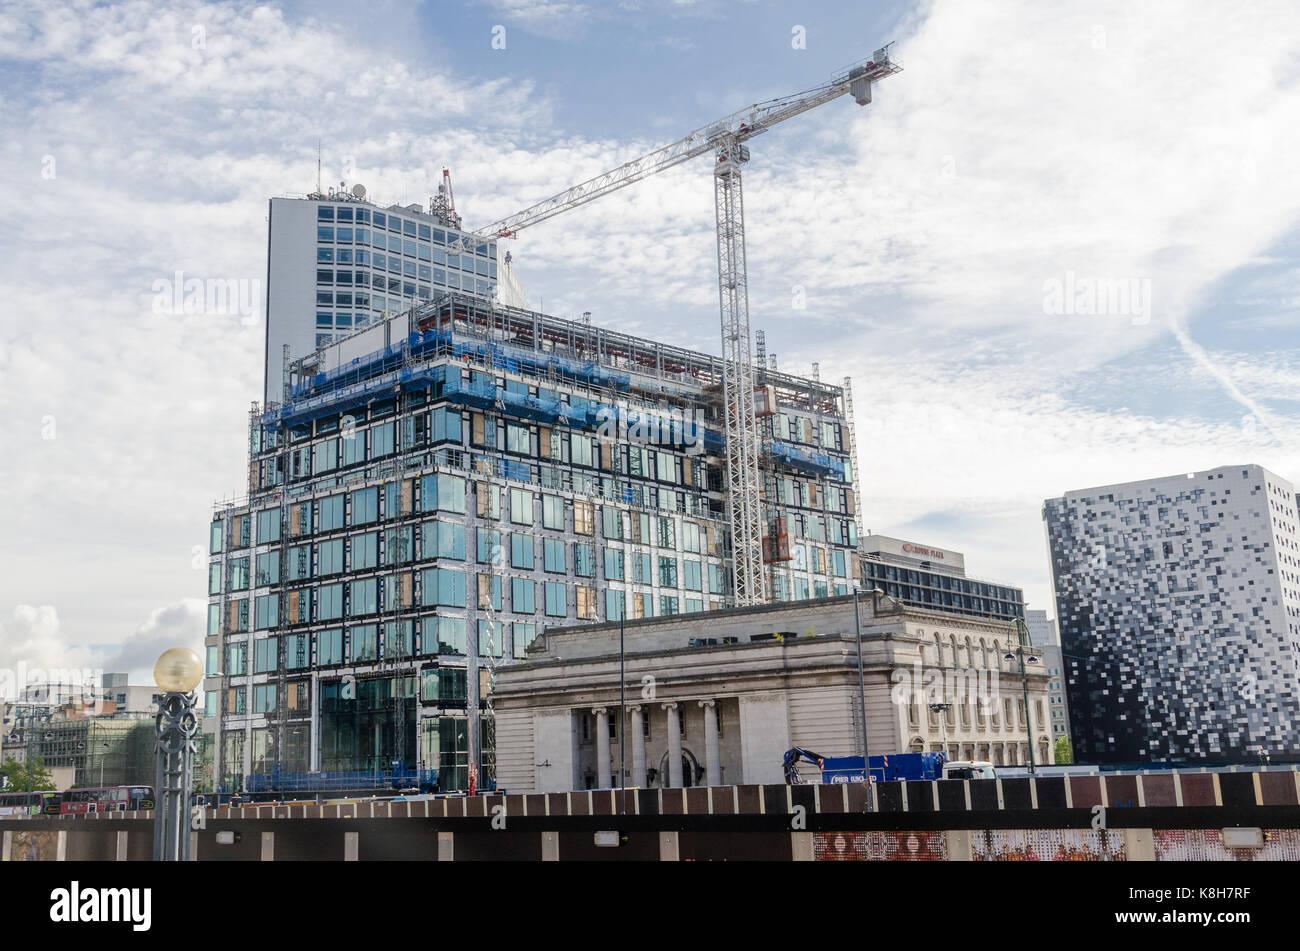 The new Birmingham headquarters of HSBC Bank under